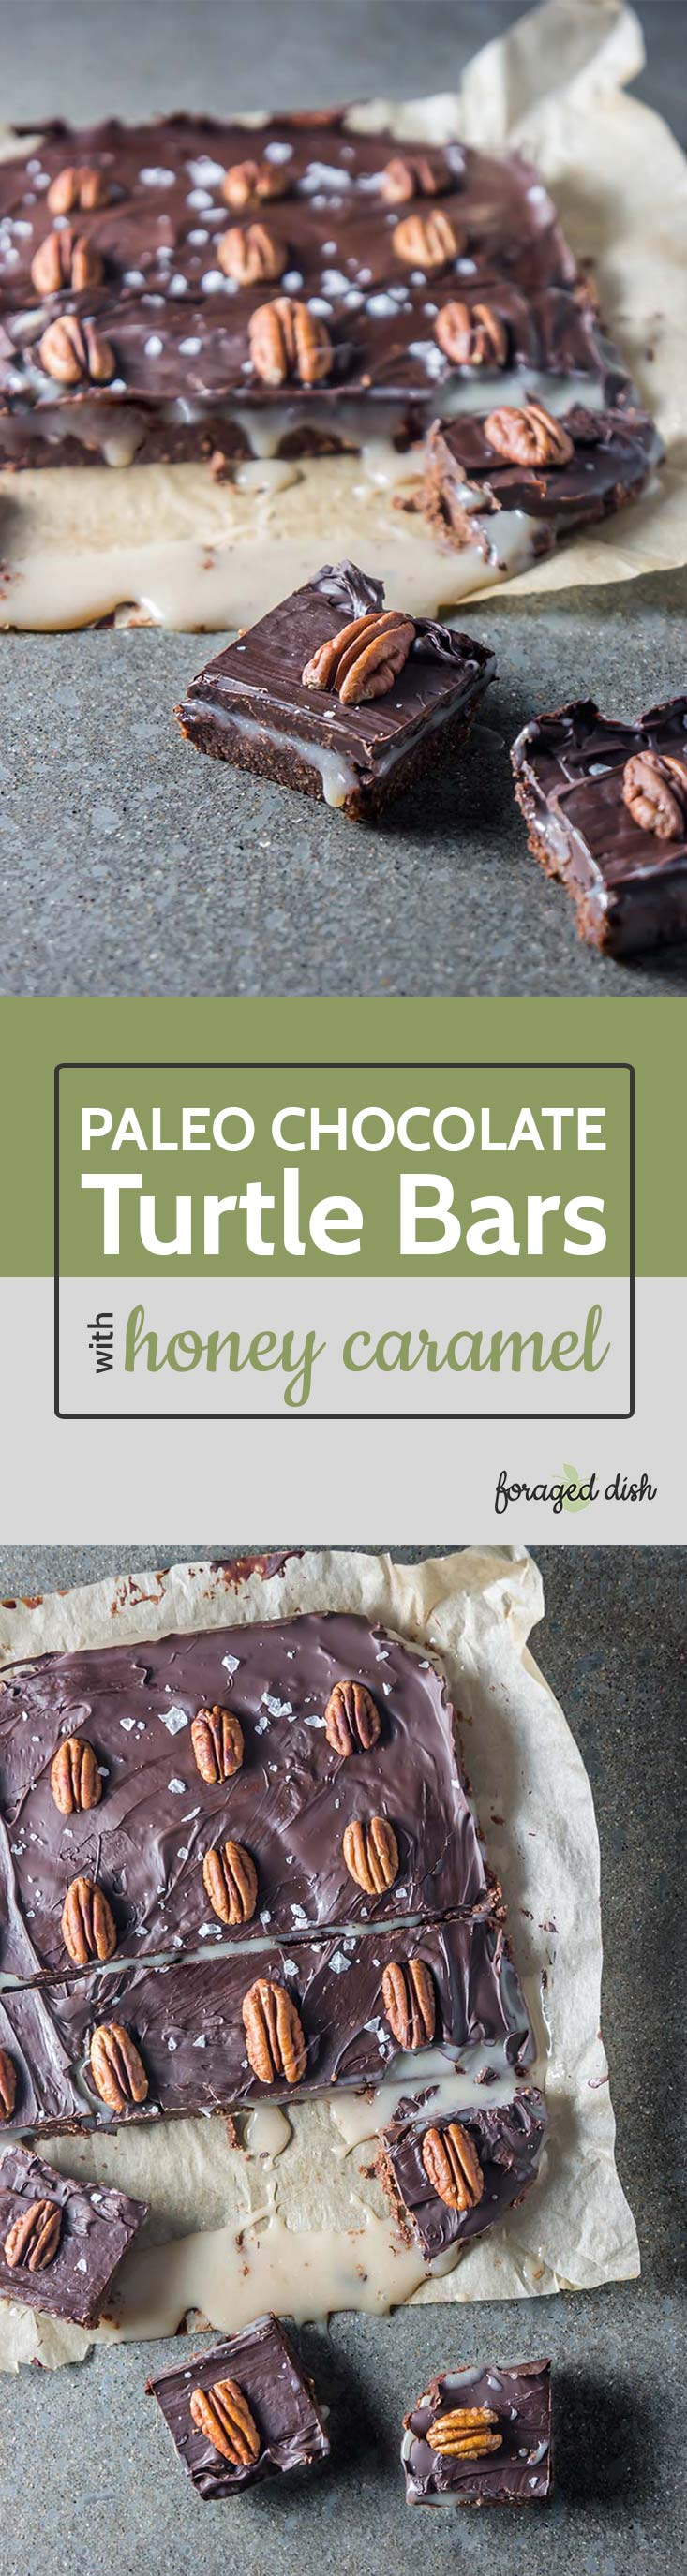 Paleo Chocolate Turtle Bars with Honey Caramel